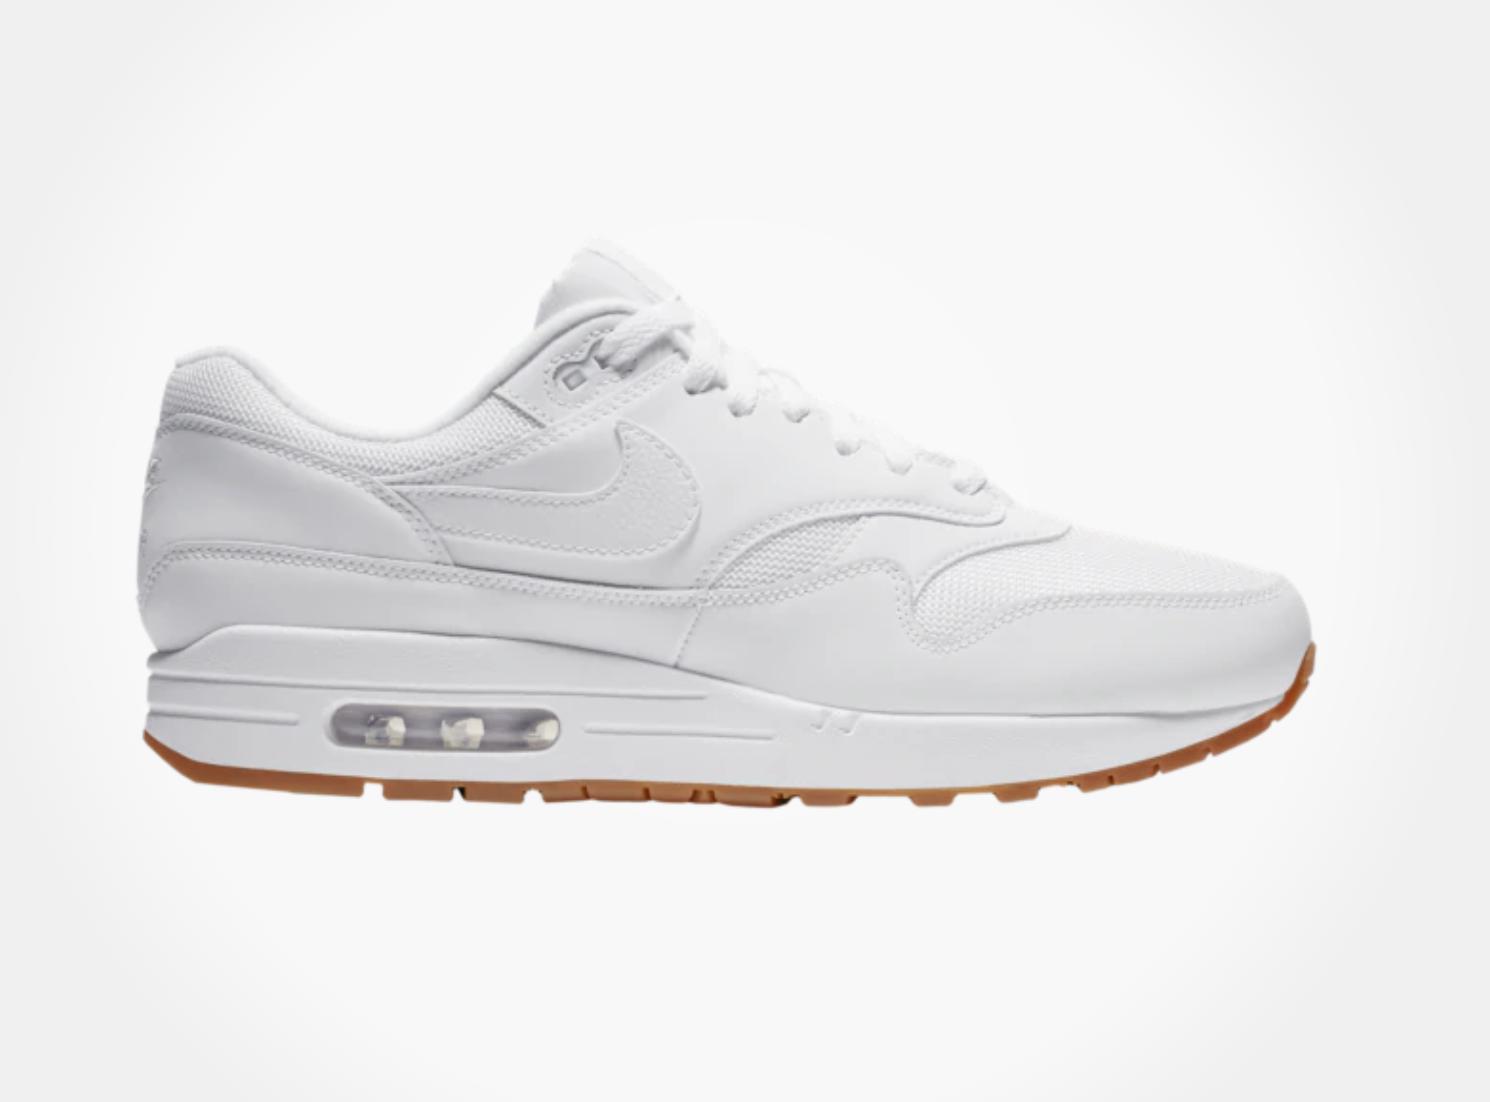 presenting promo code huge sale Nike Air Max 1 - white/gum - size 13 | Wish List in 2019 ...